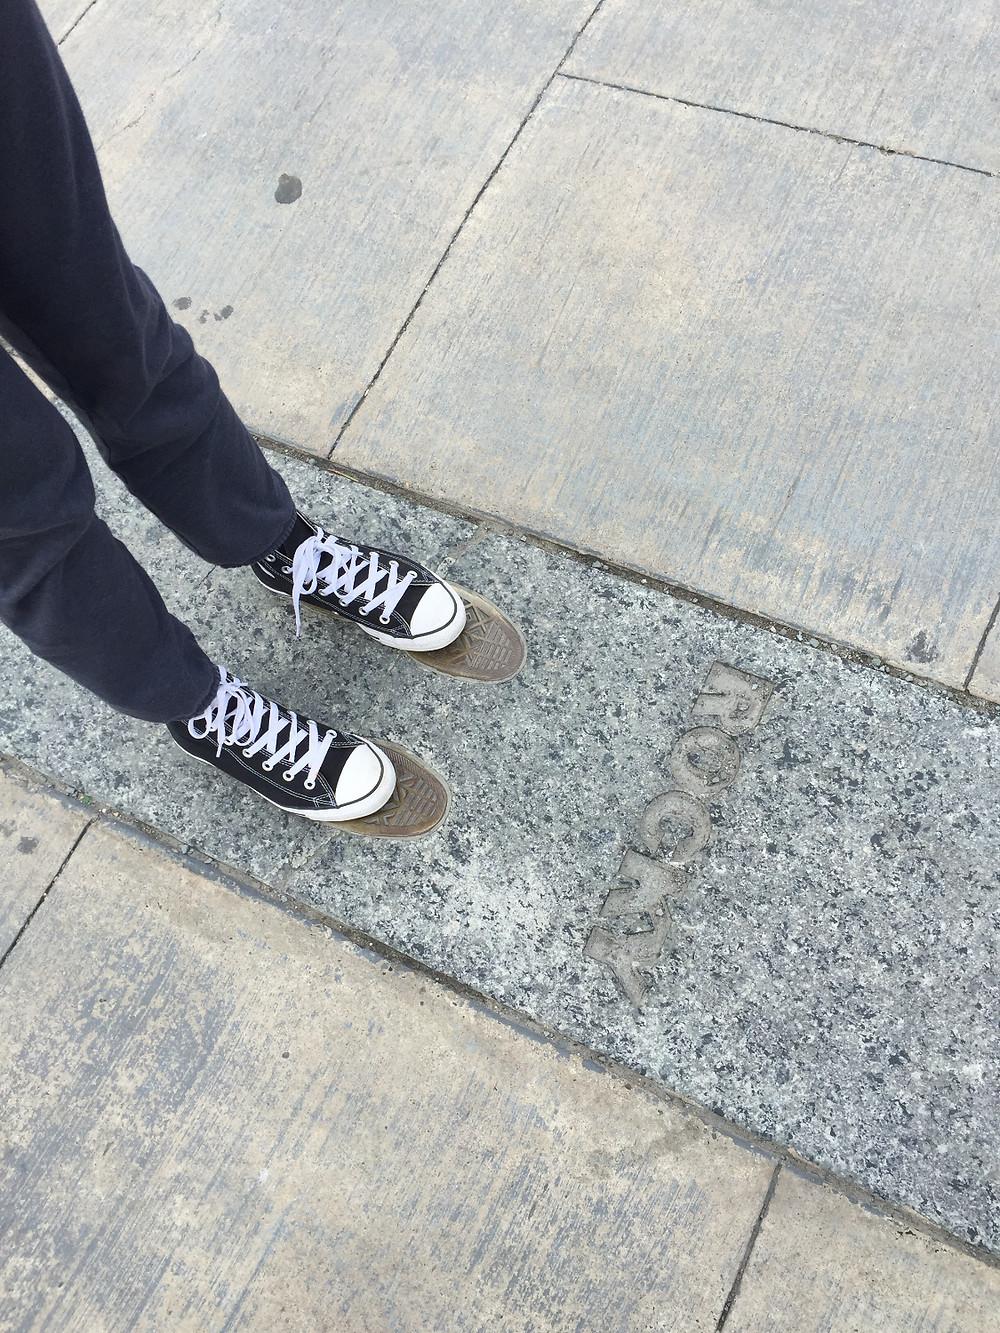 Madeline in Rocky's Footsteps